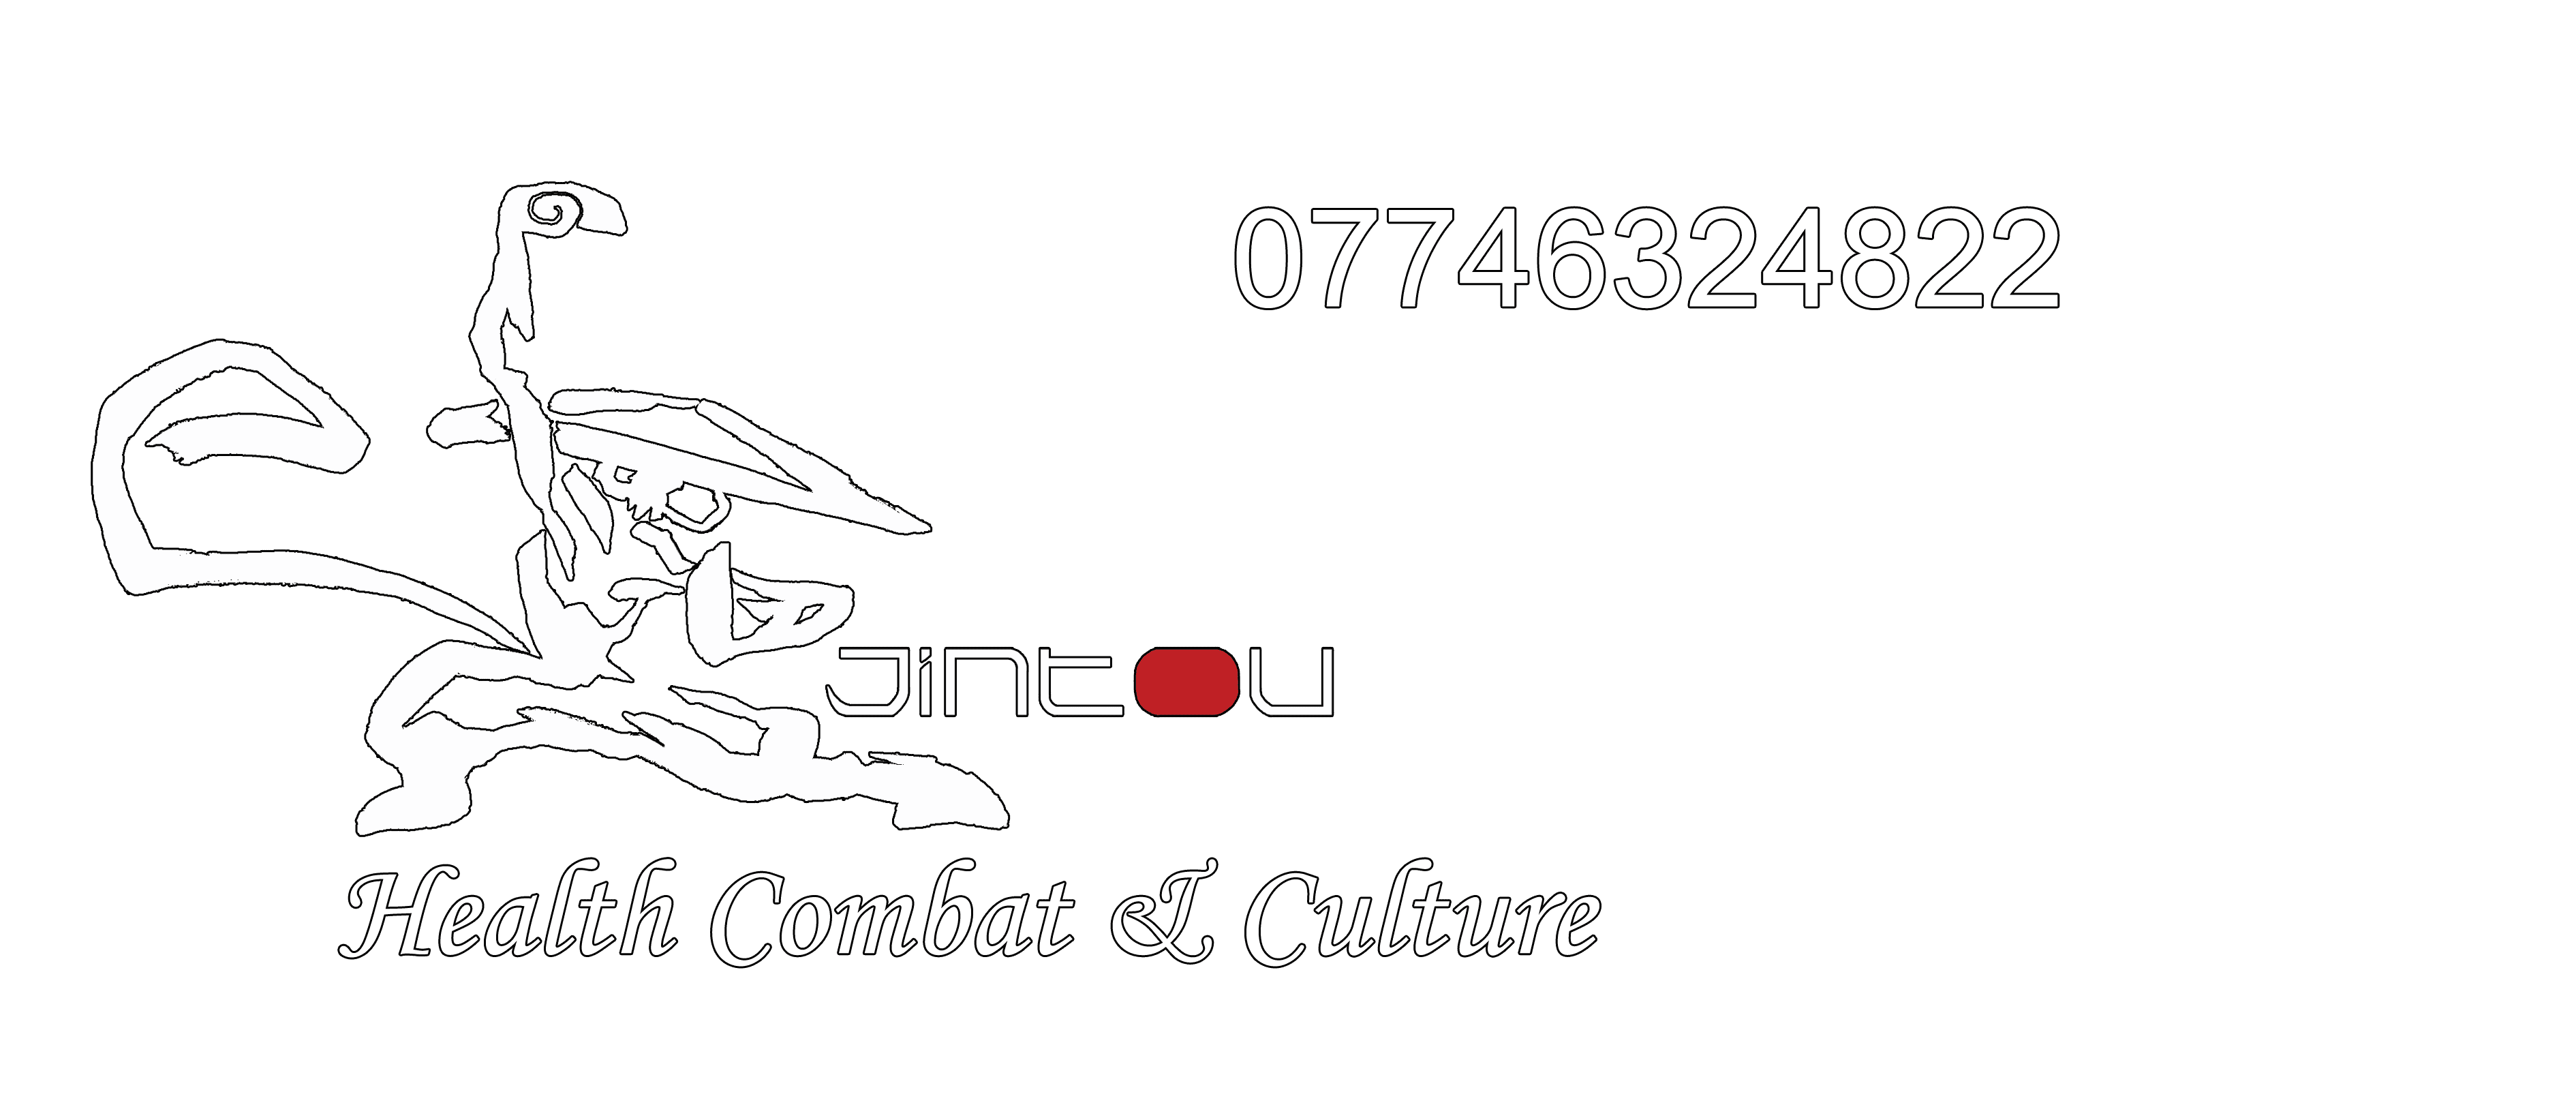 jintou, health combat, culture